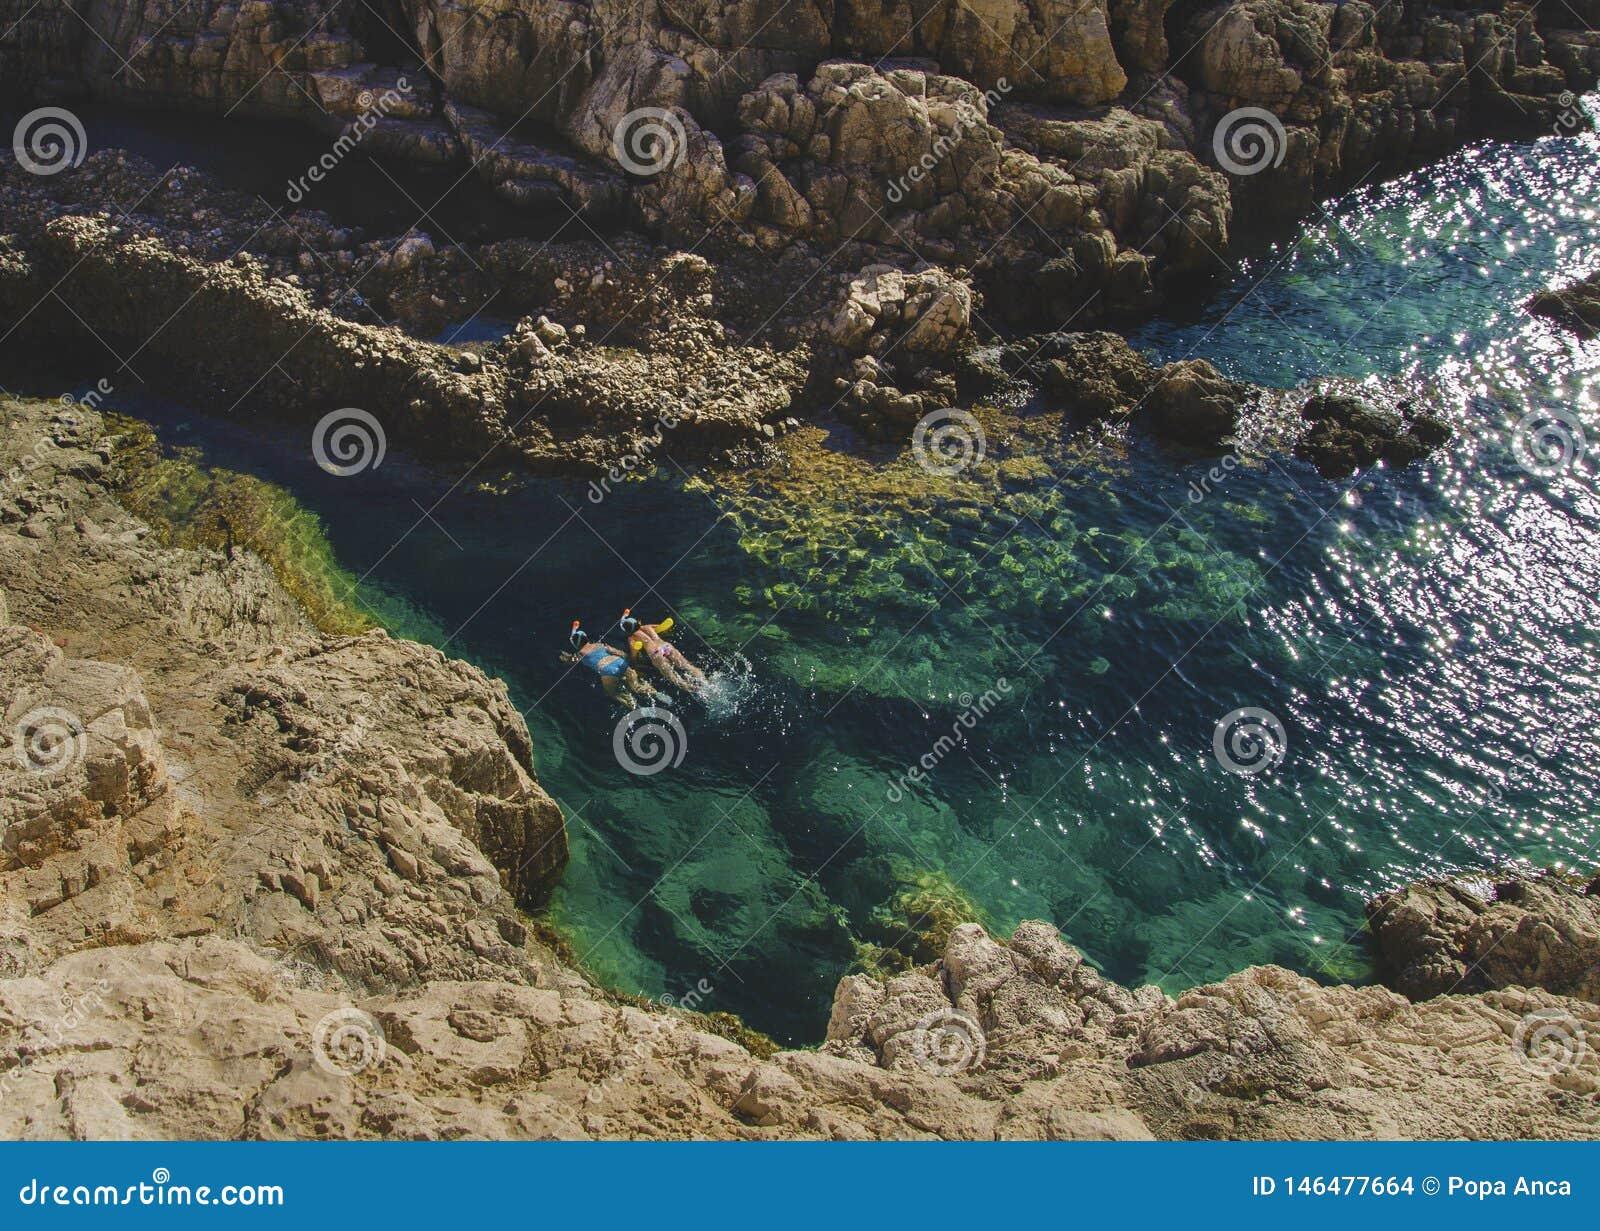 Wo-personer som simmar och snorklar i det kristallklara turkosvattnet i Korakonissi, Zakynthos